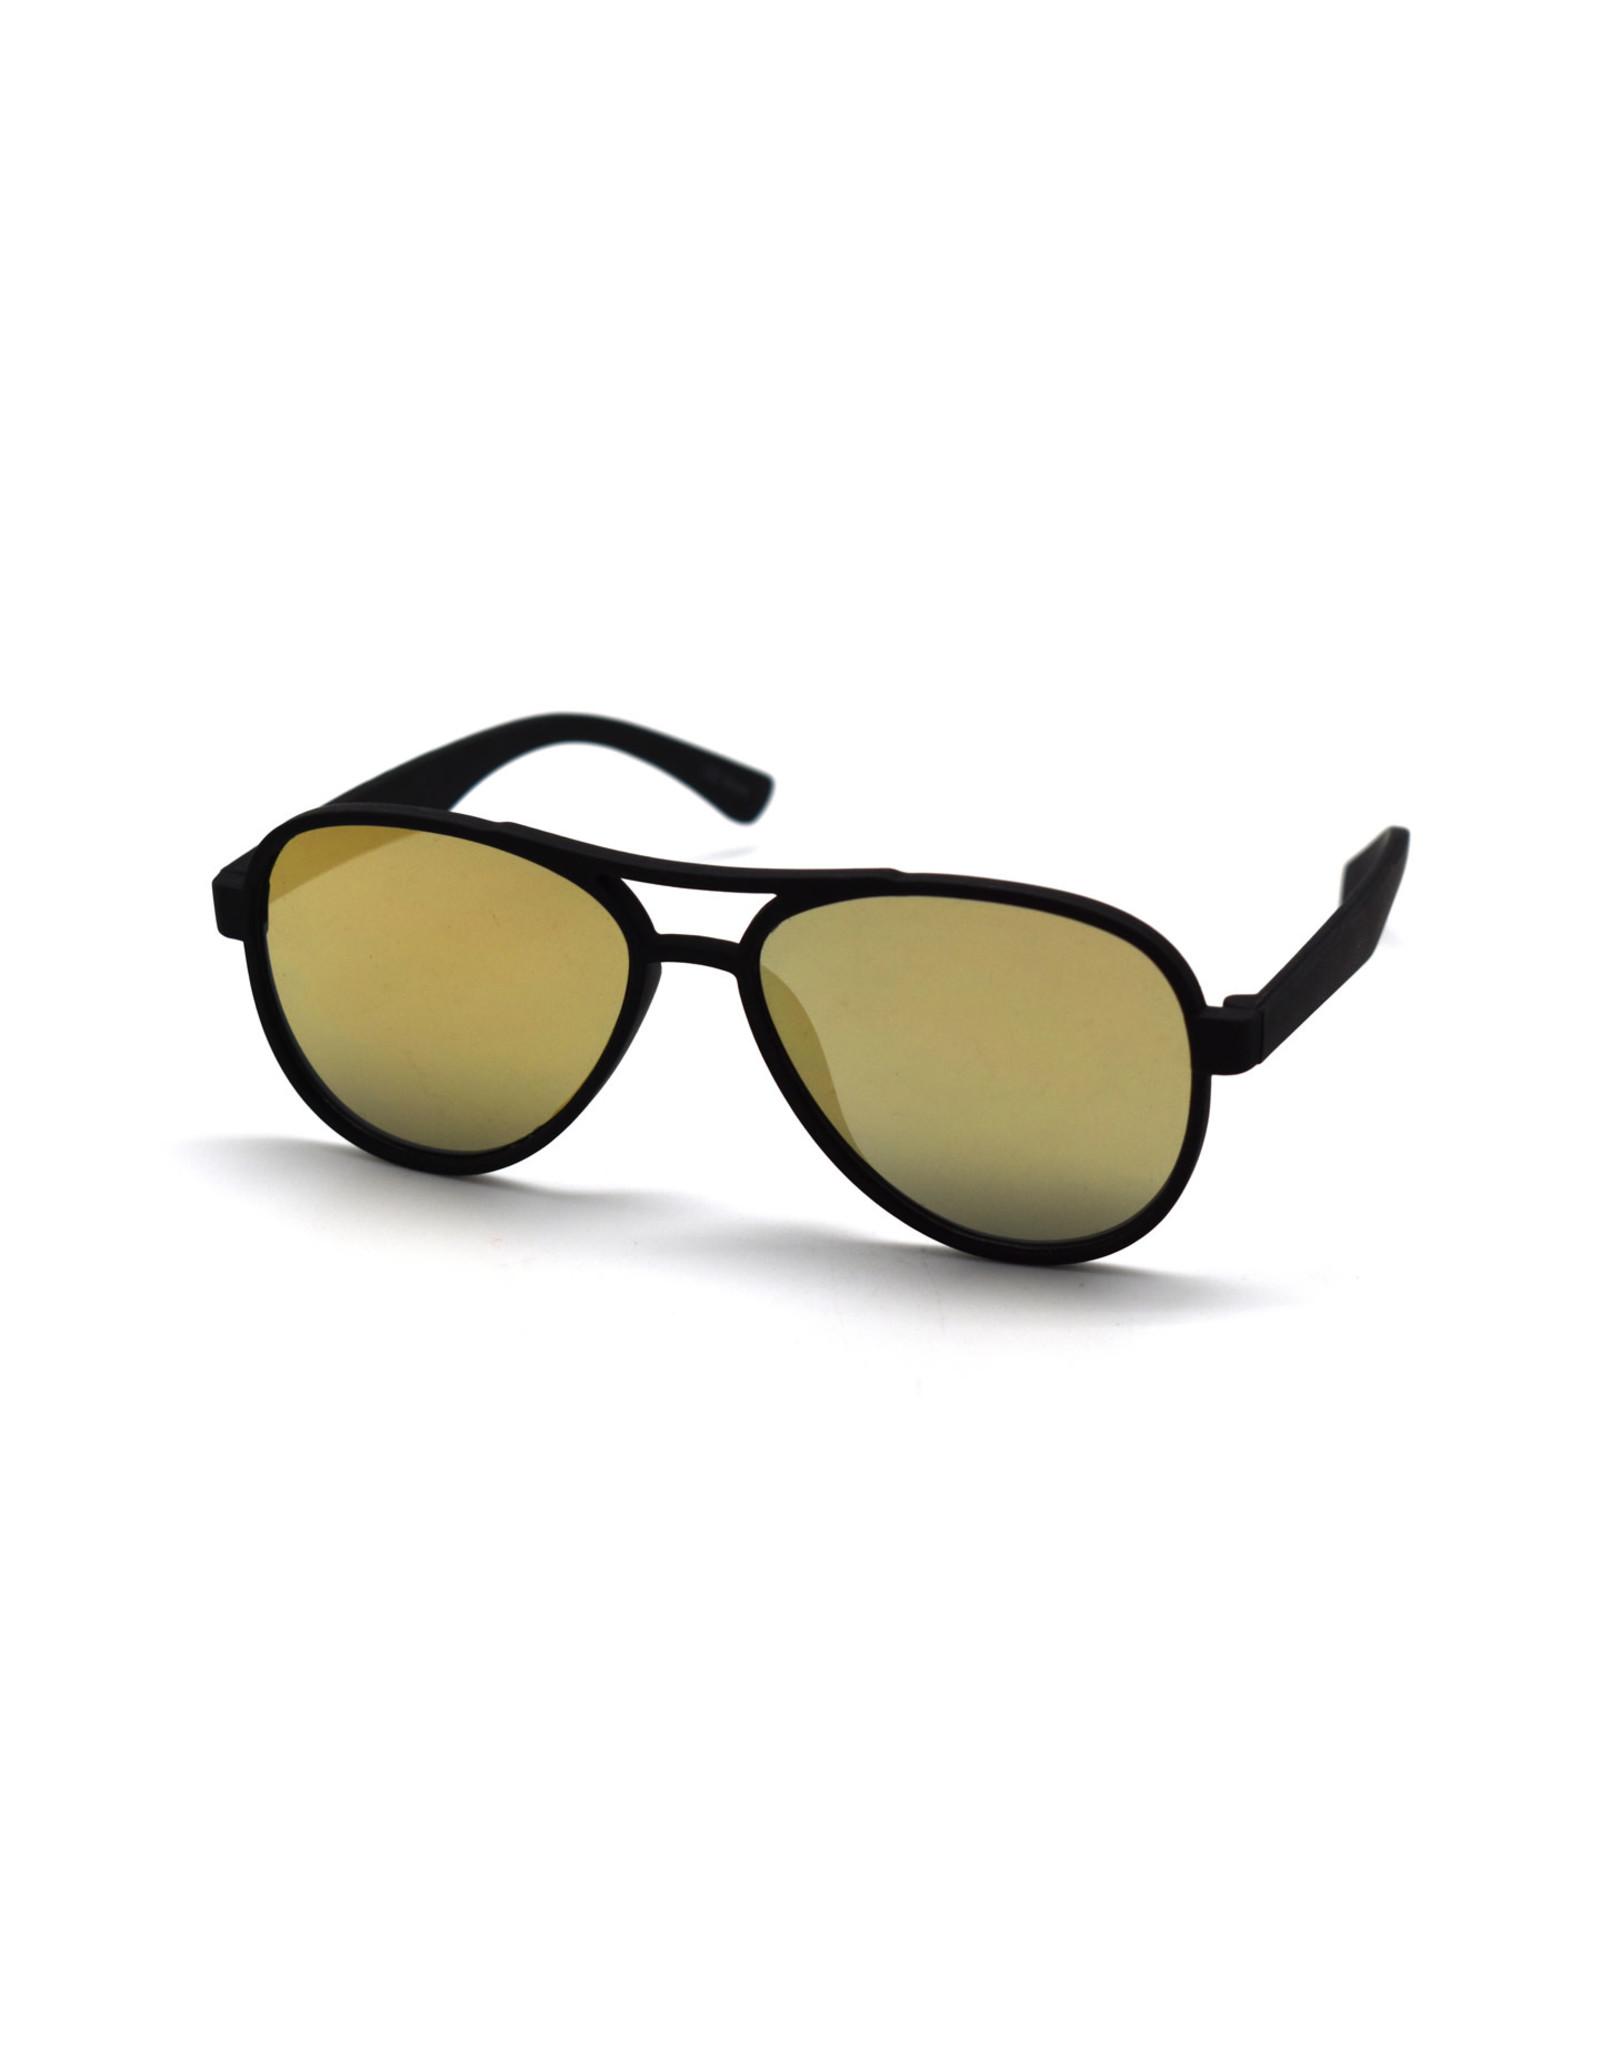 Rick Sunglasses (2 Colors!)